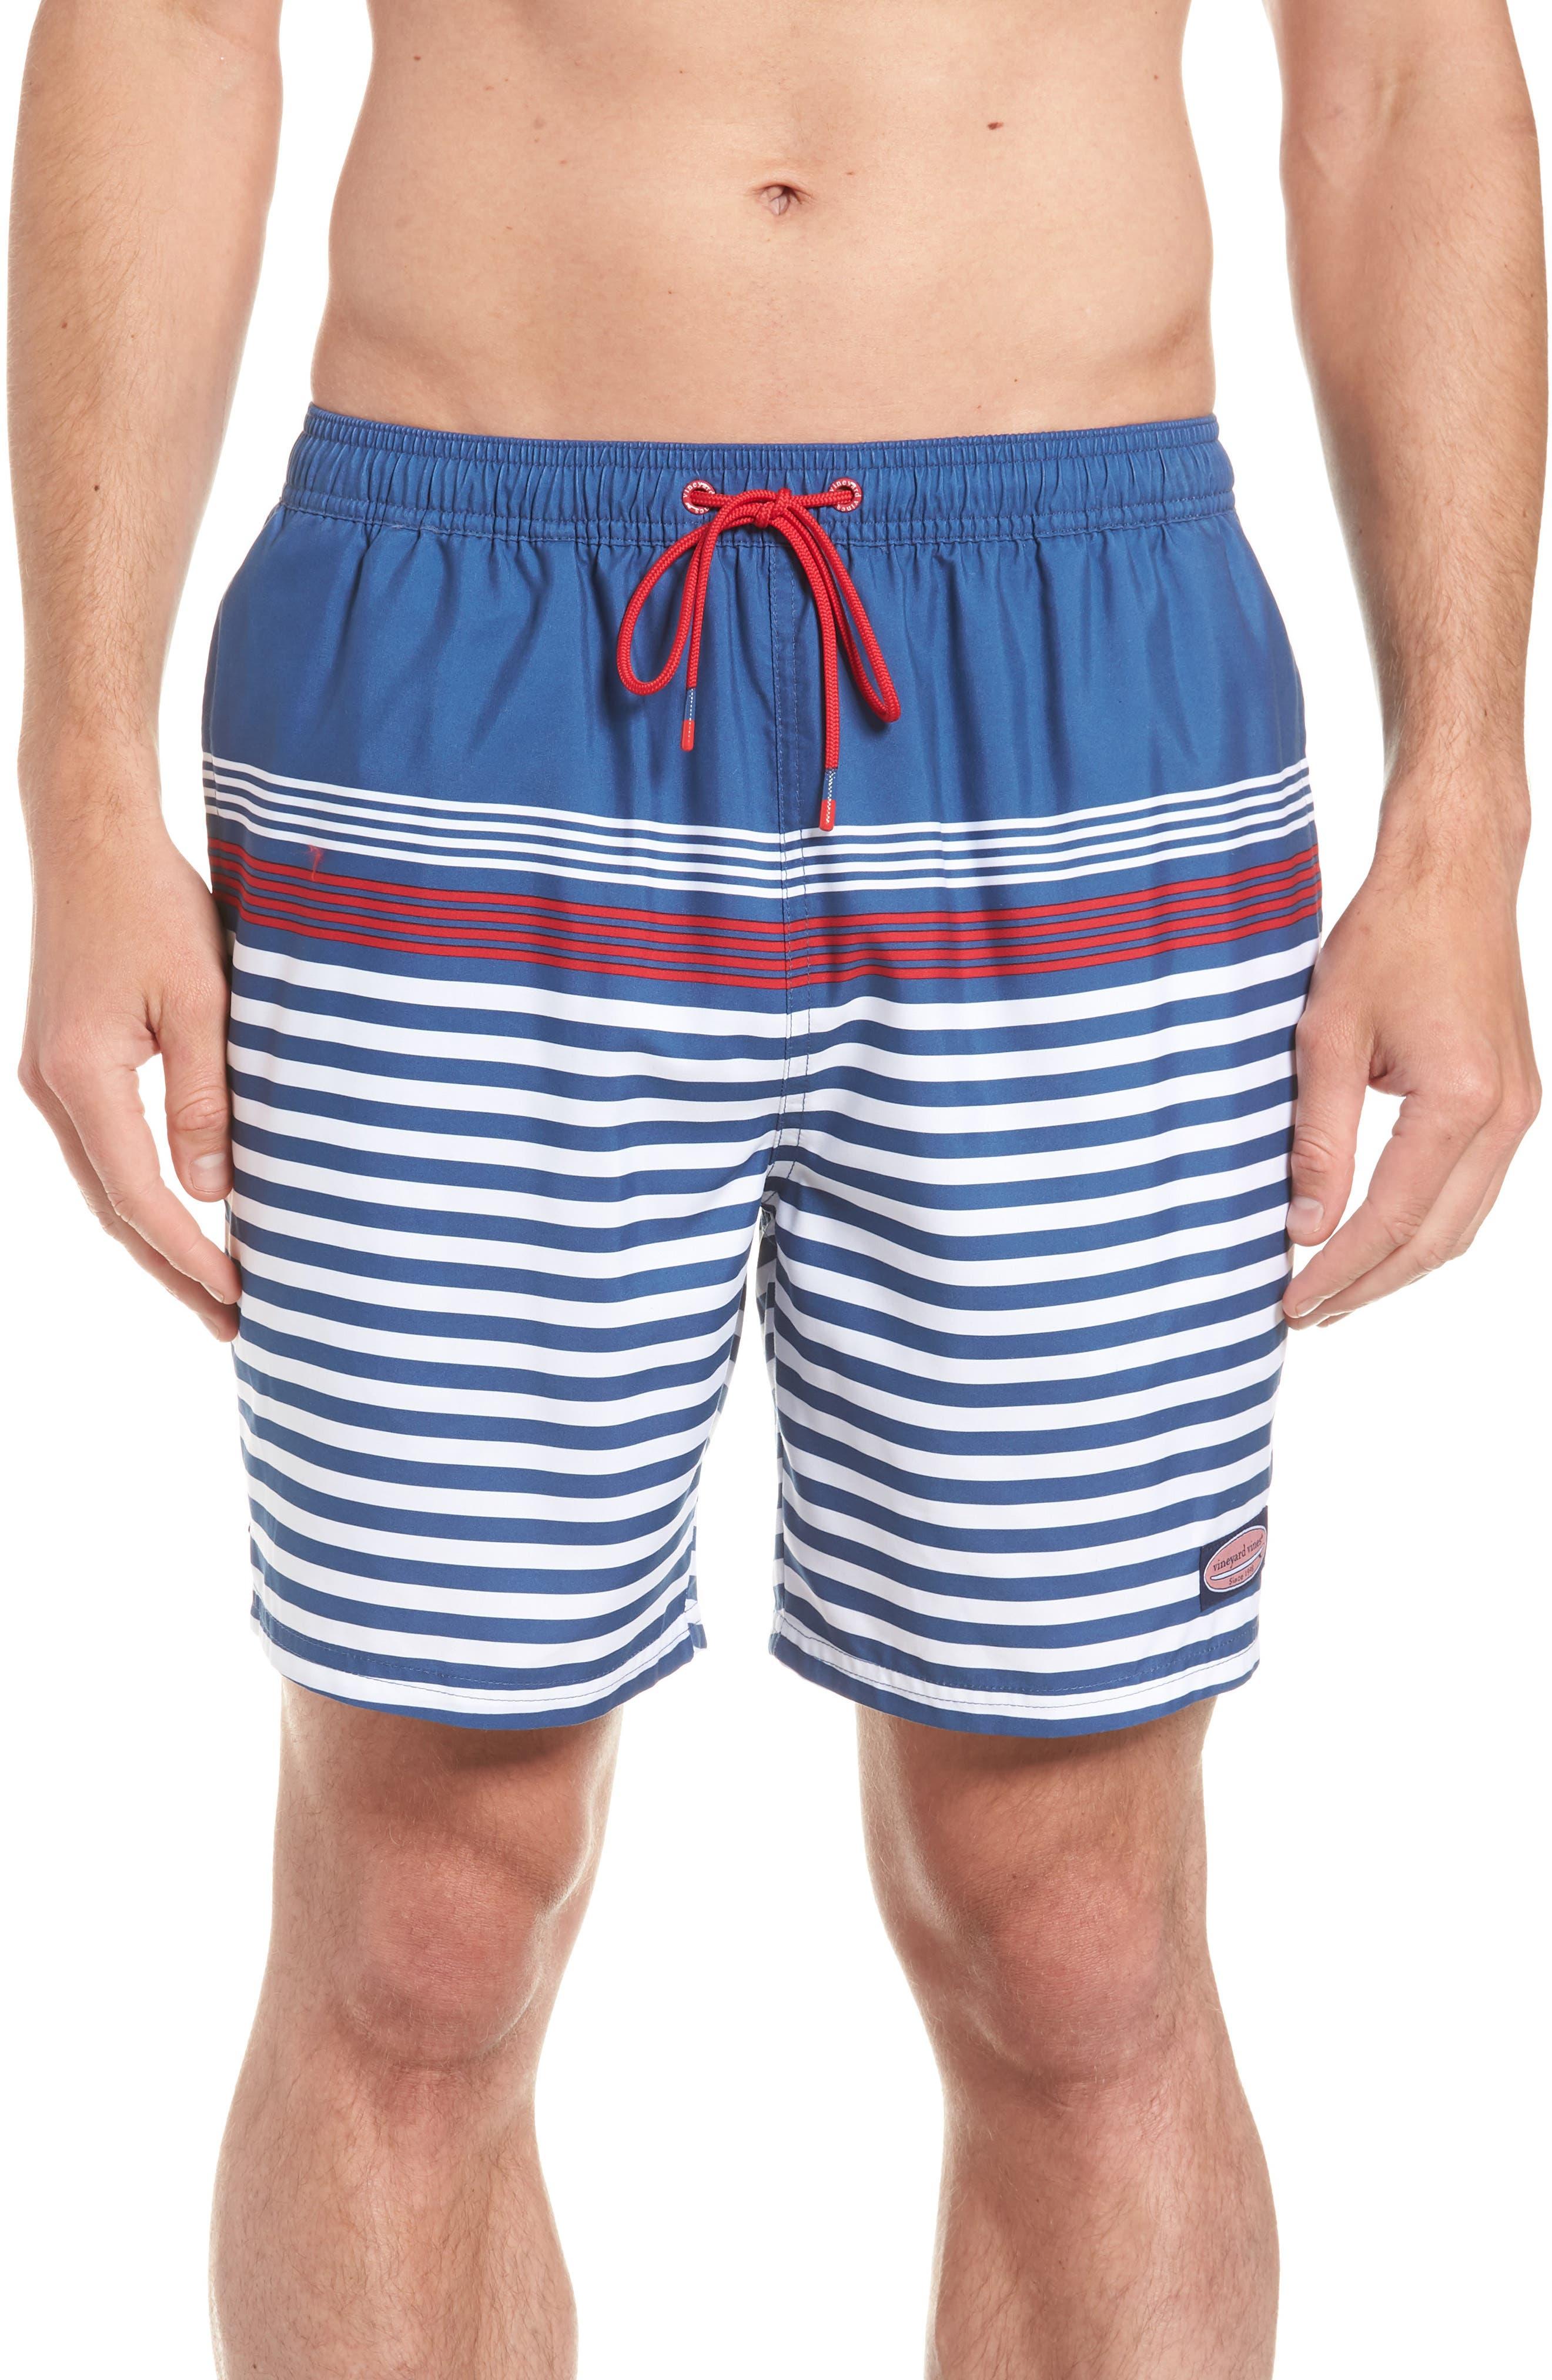 Chappy Summerall Stripe Swim Trunks,                             Main thumbnail 1, color,                             461